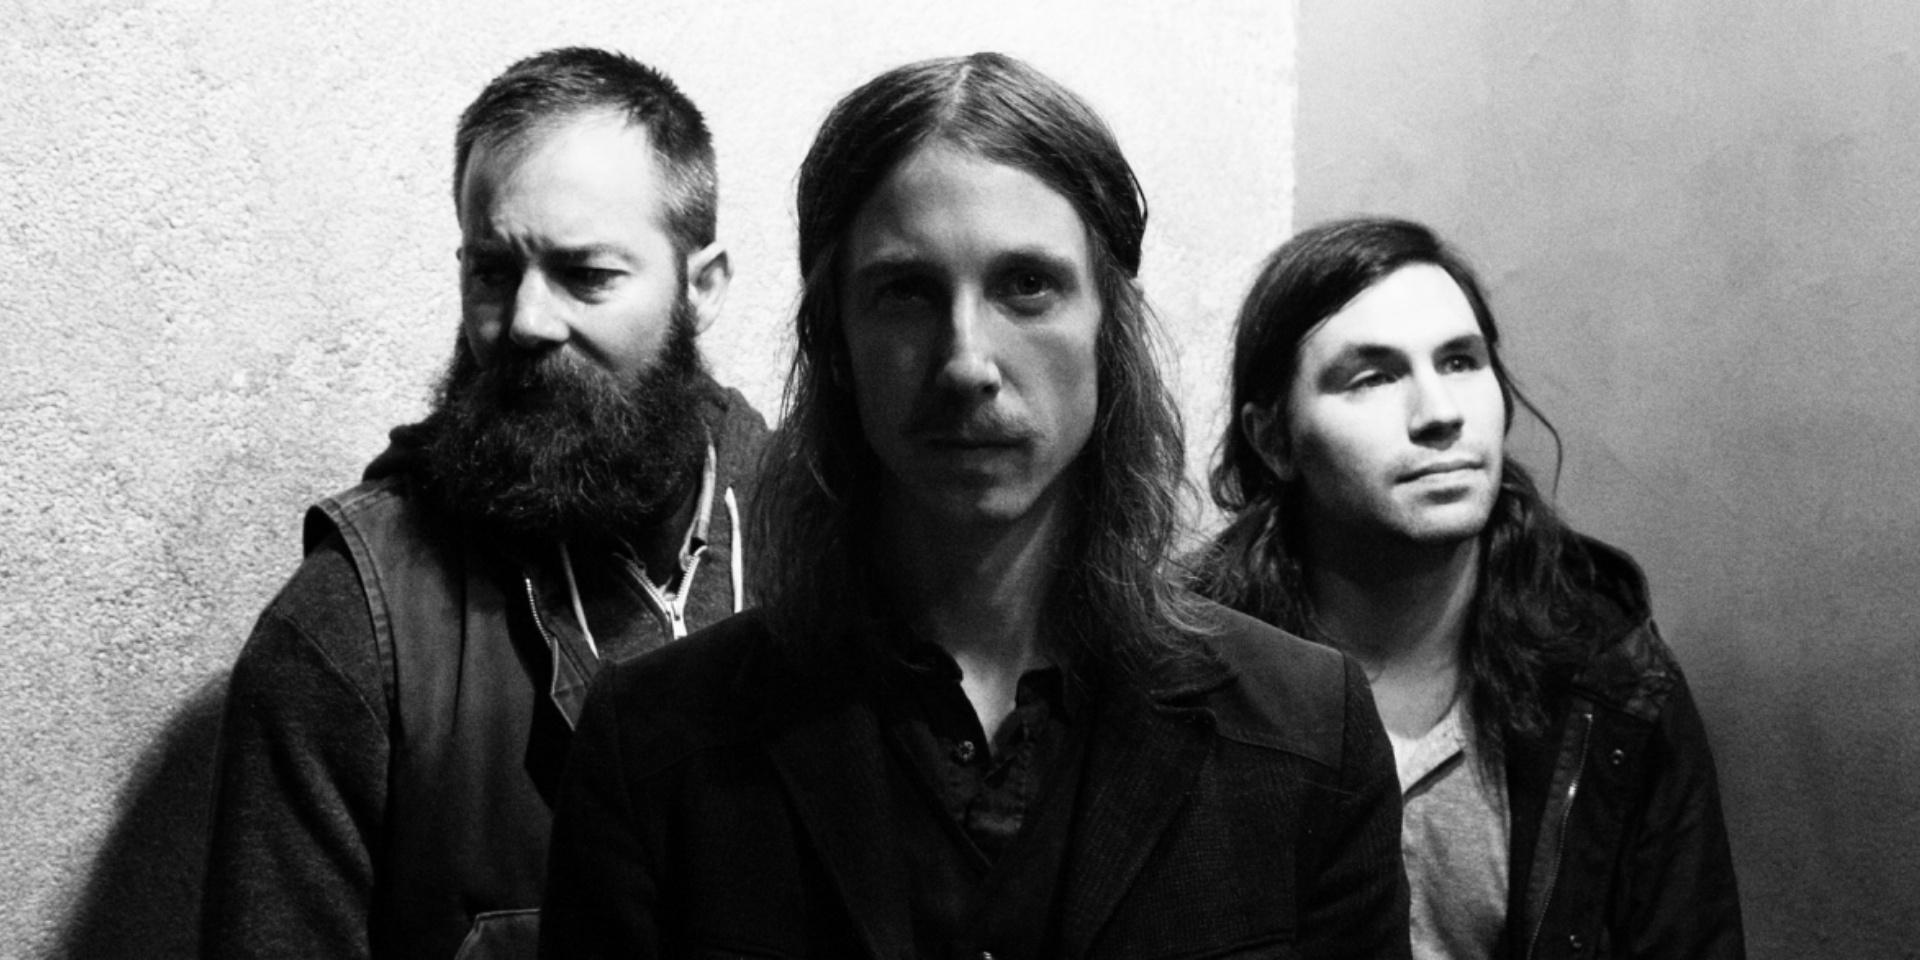 Russian Circles announce new album, release new single 'Arluck' – listen